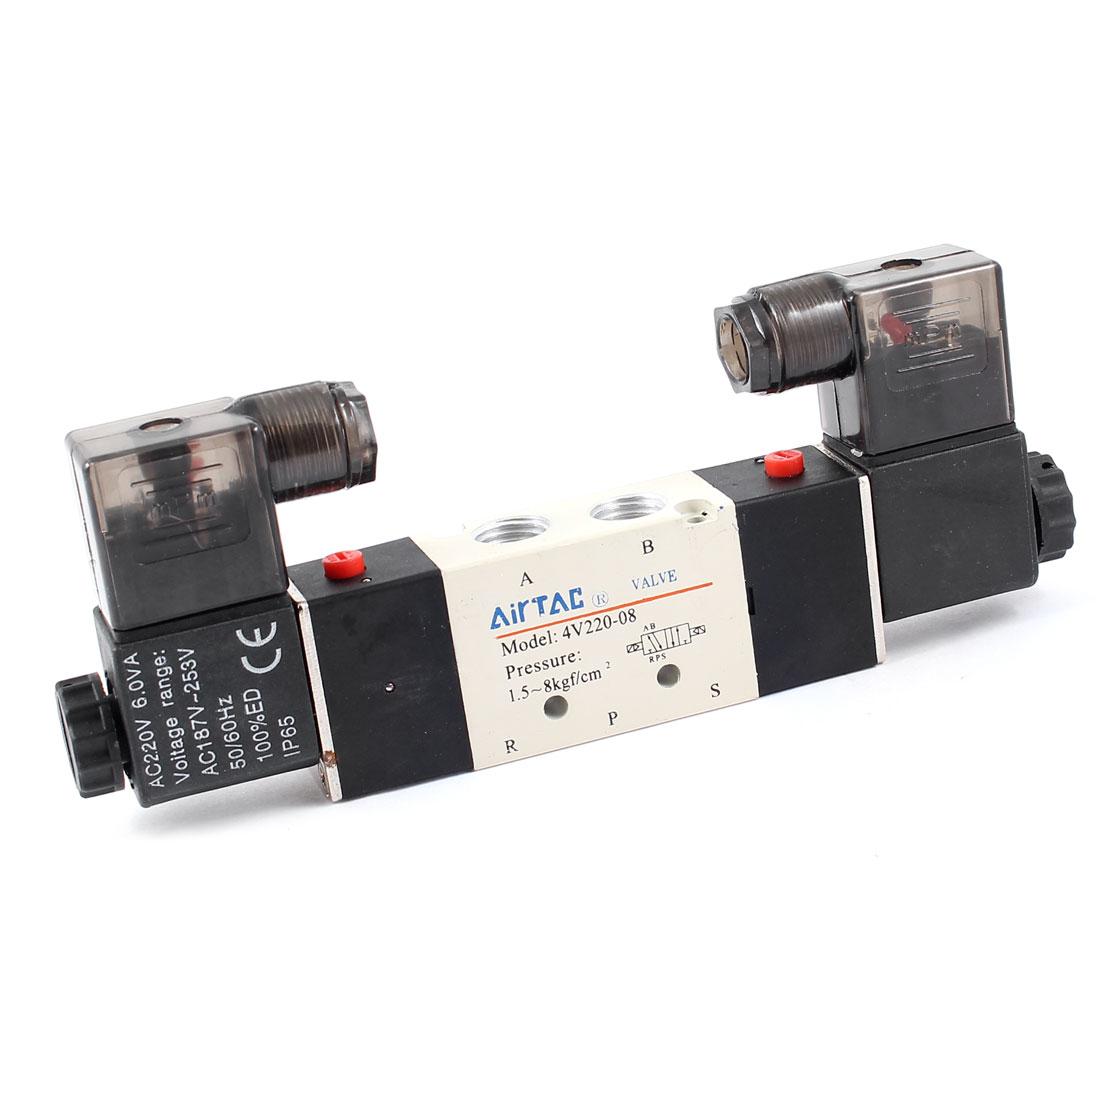 4V220-08 5 Ports 2 Positions Electromagnetic Air Solenoid Valve AC220V 6VA